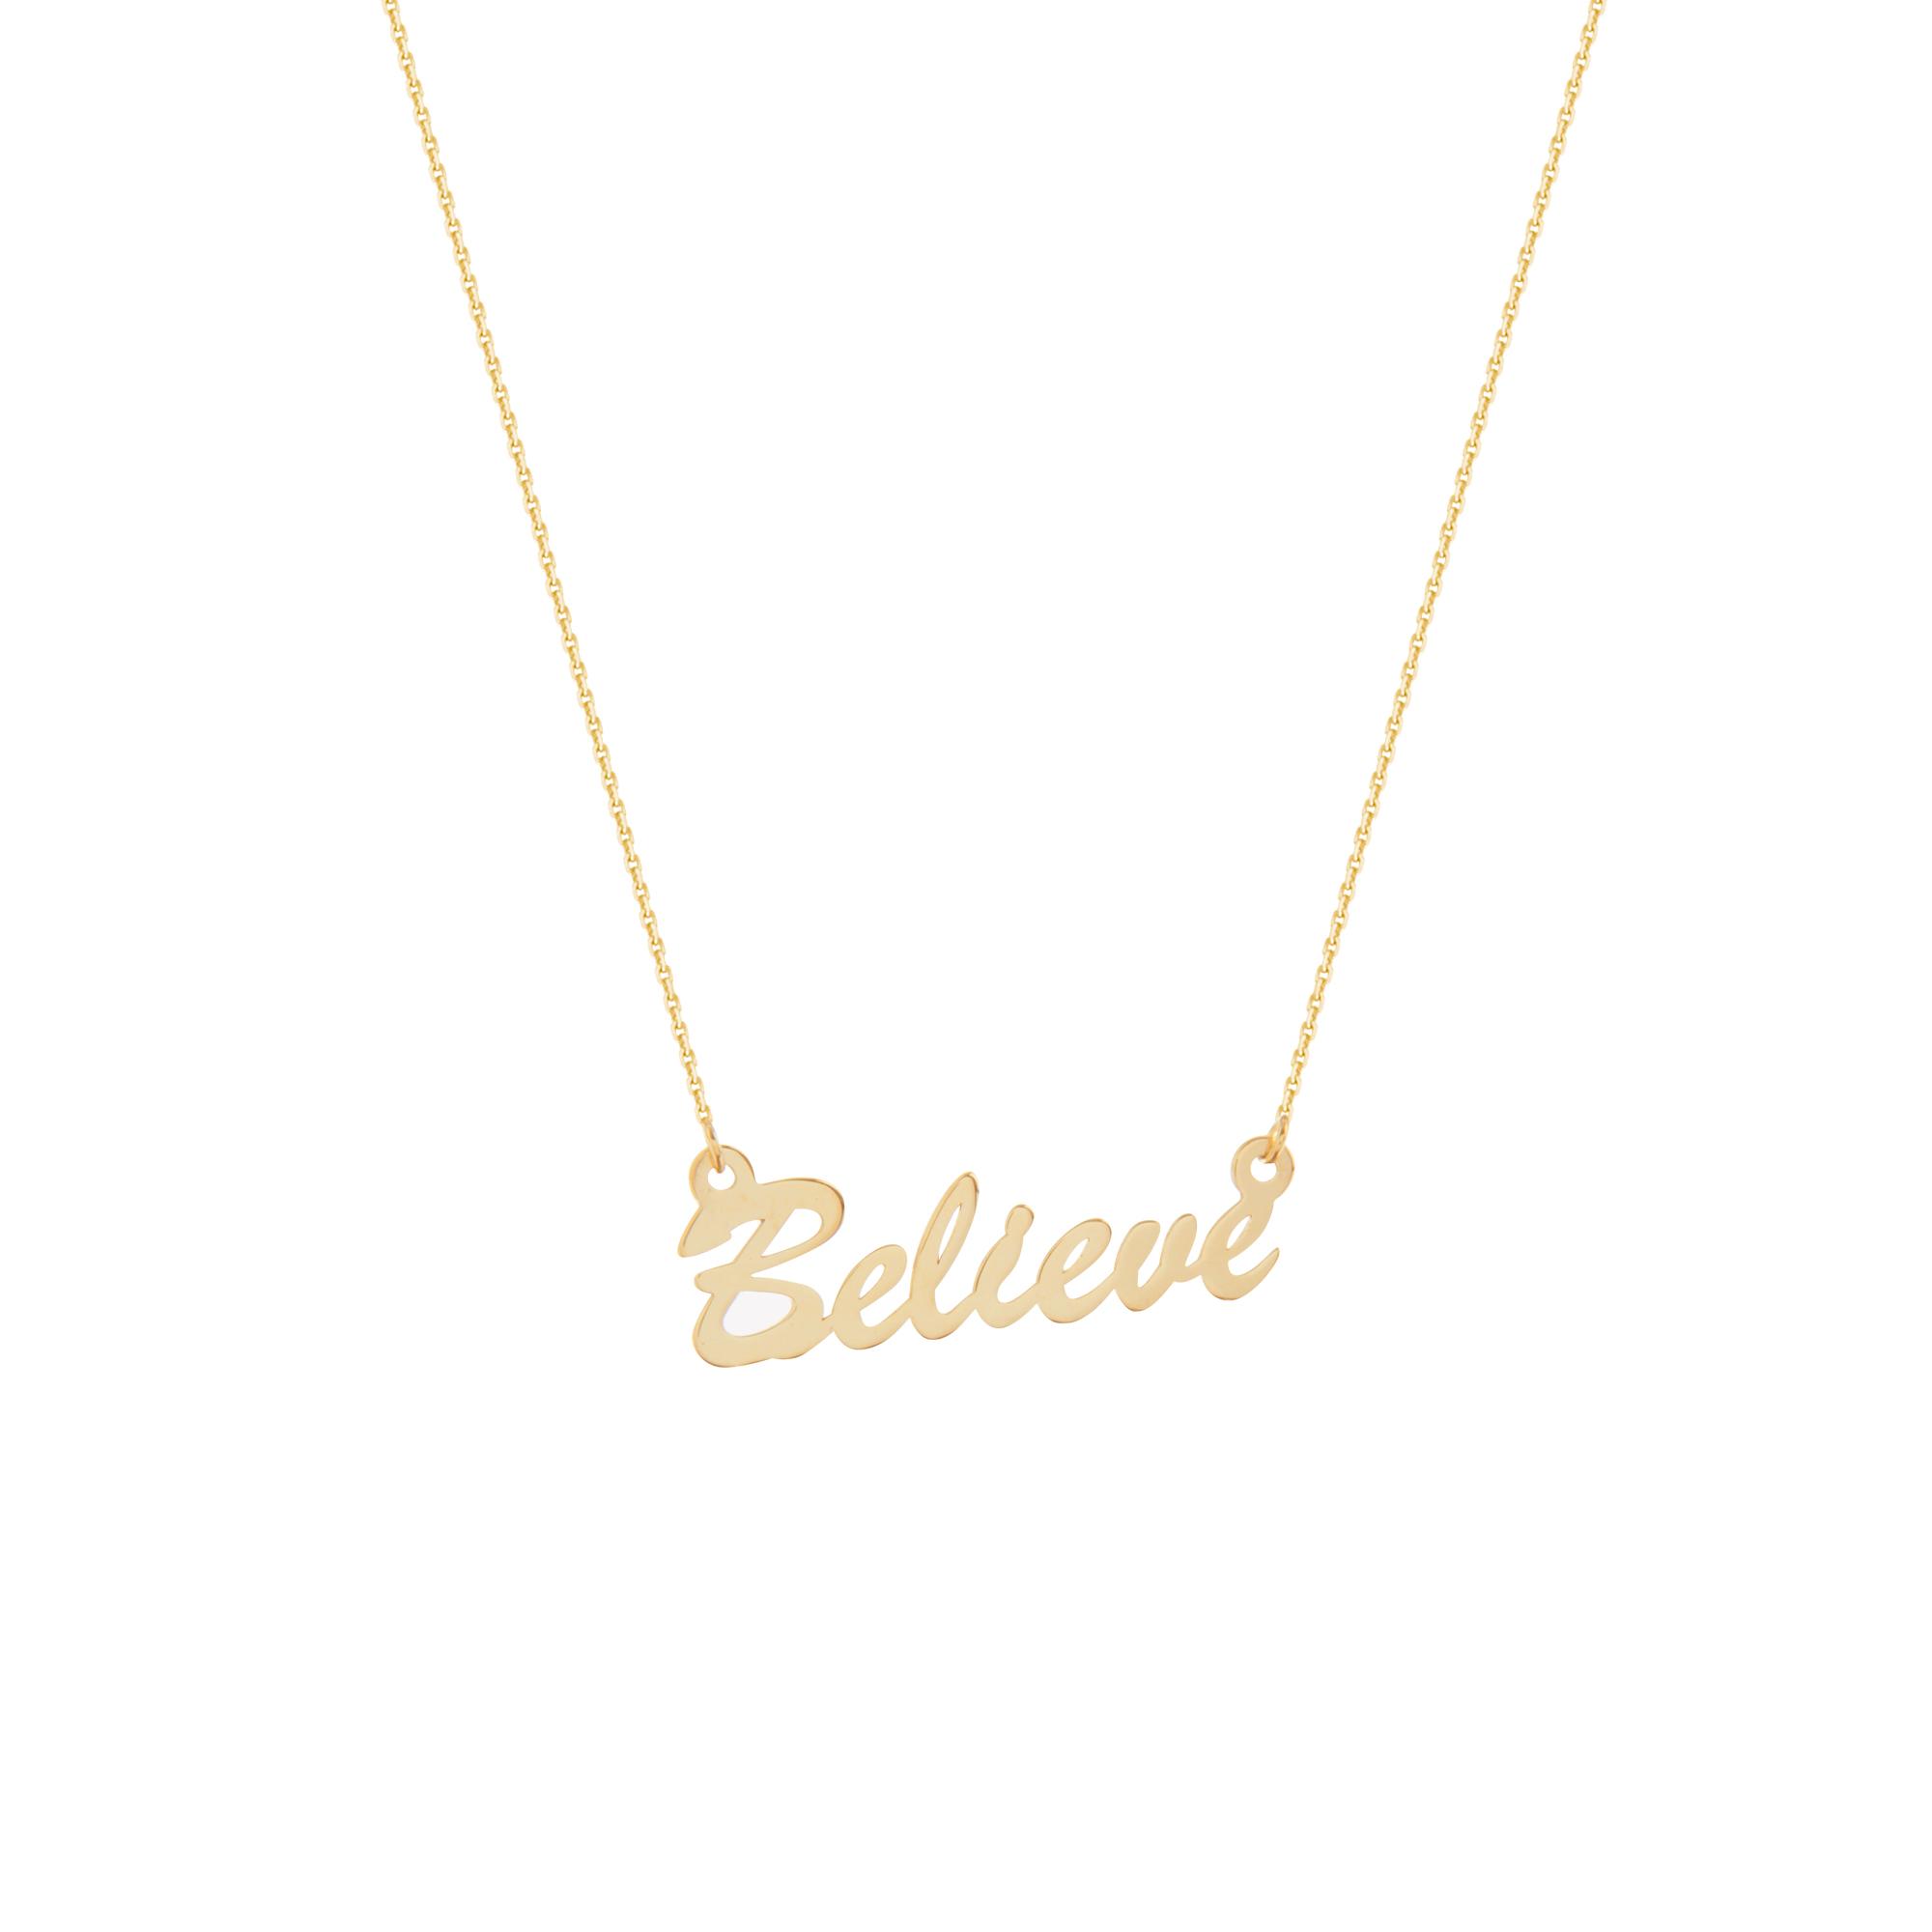 Believe Necklace, 14Kt Gold Believe Necklace 18